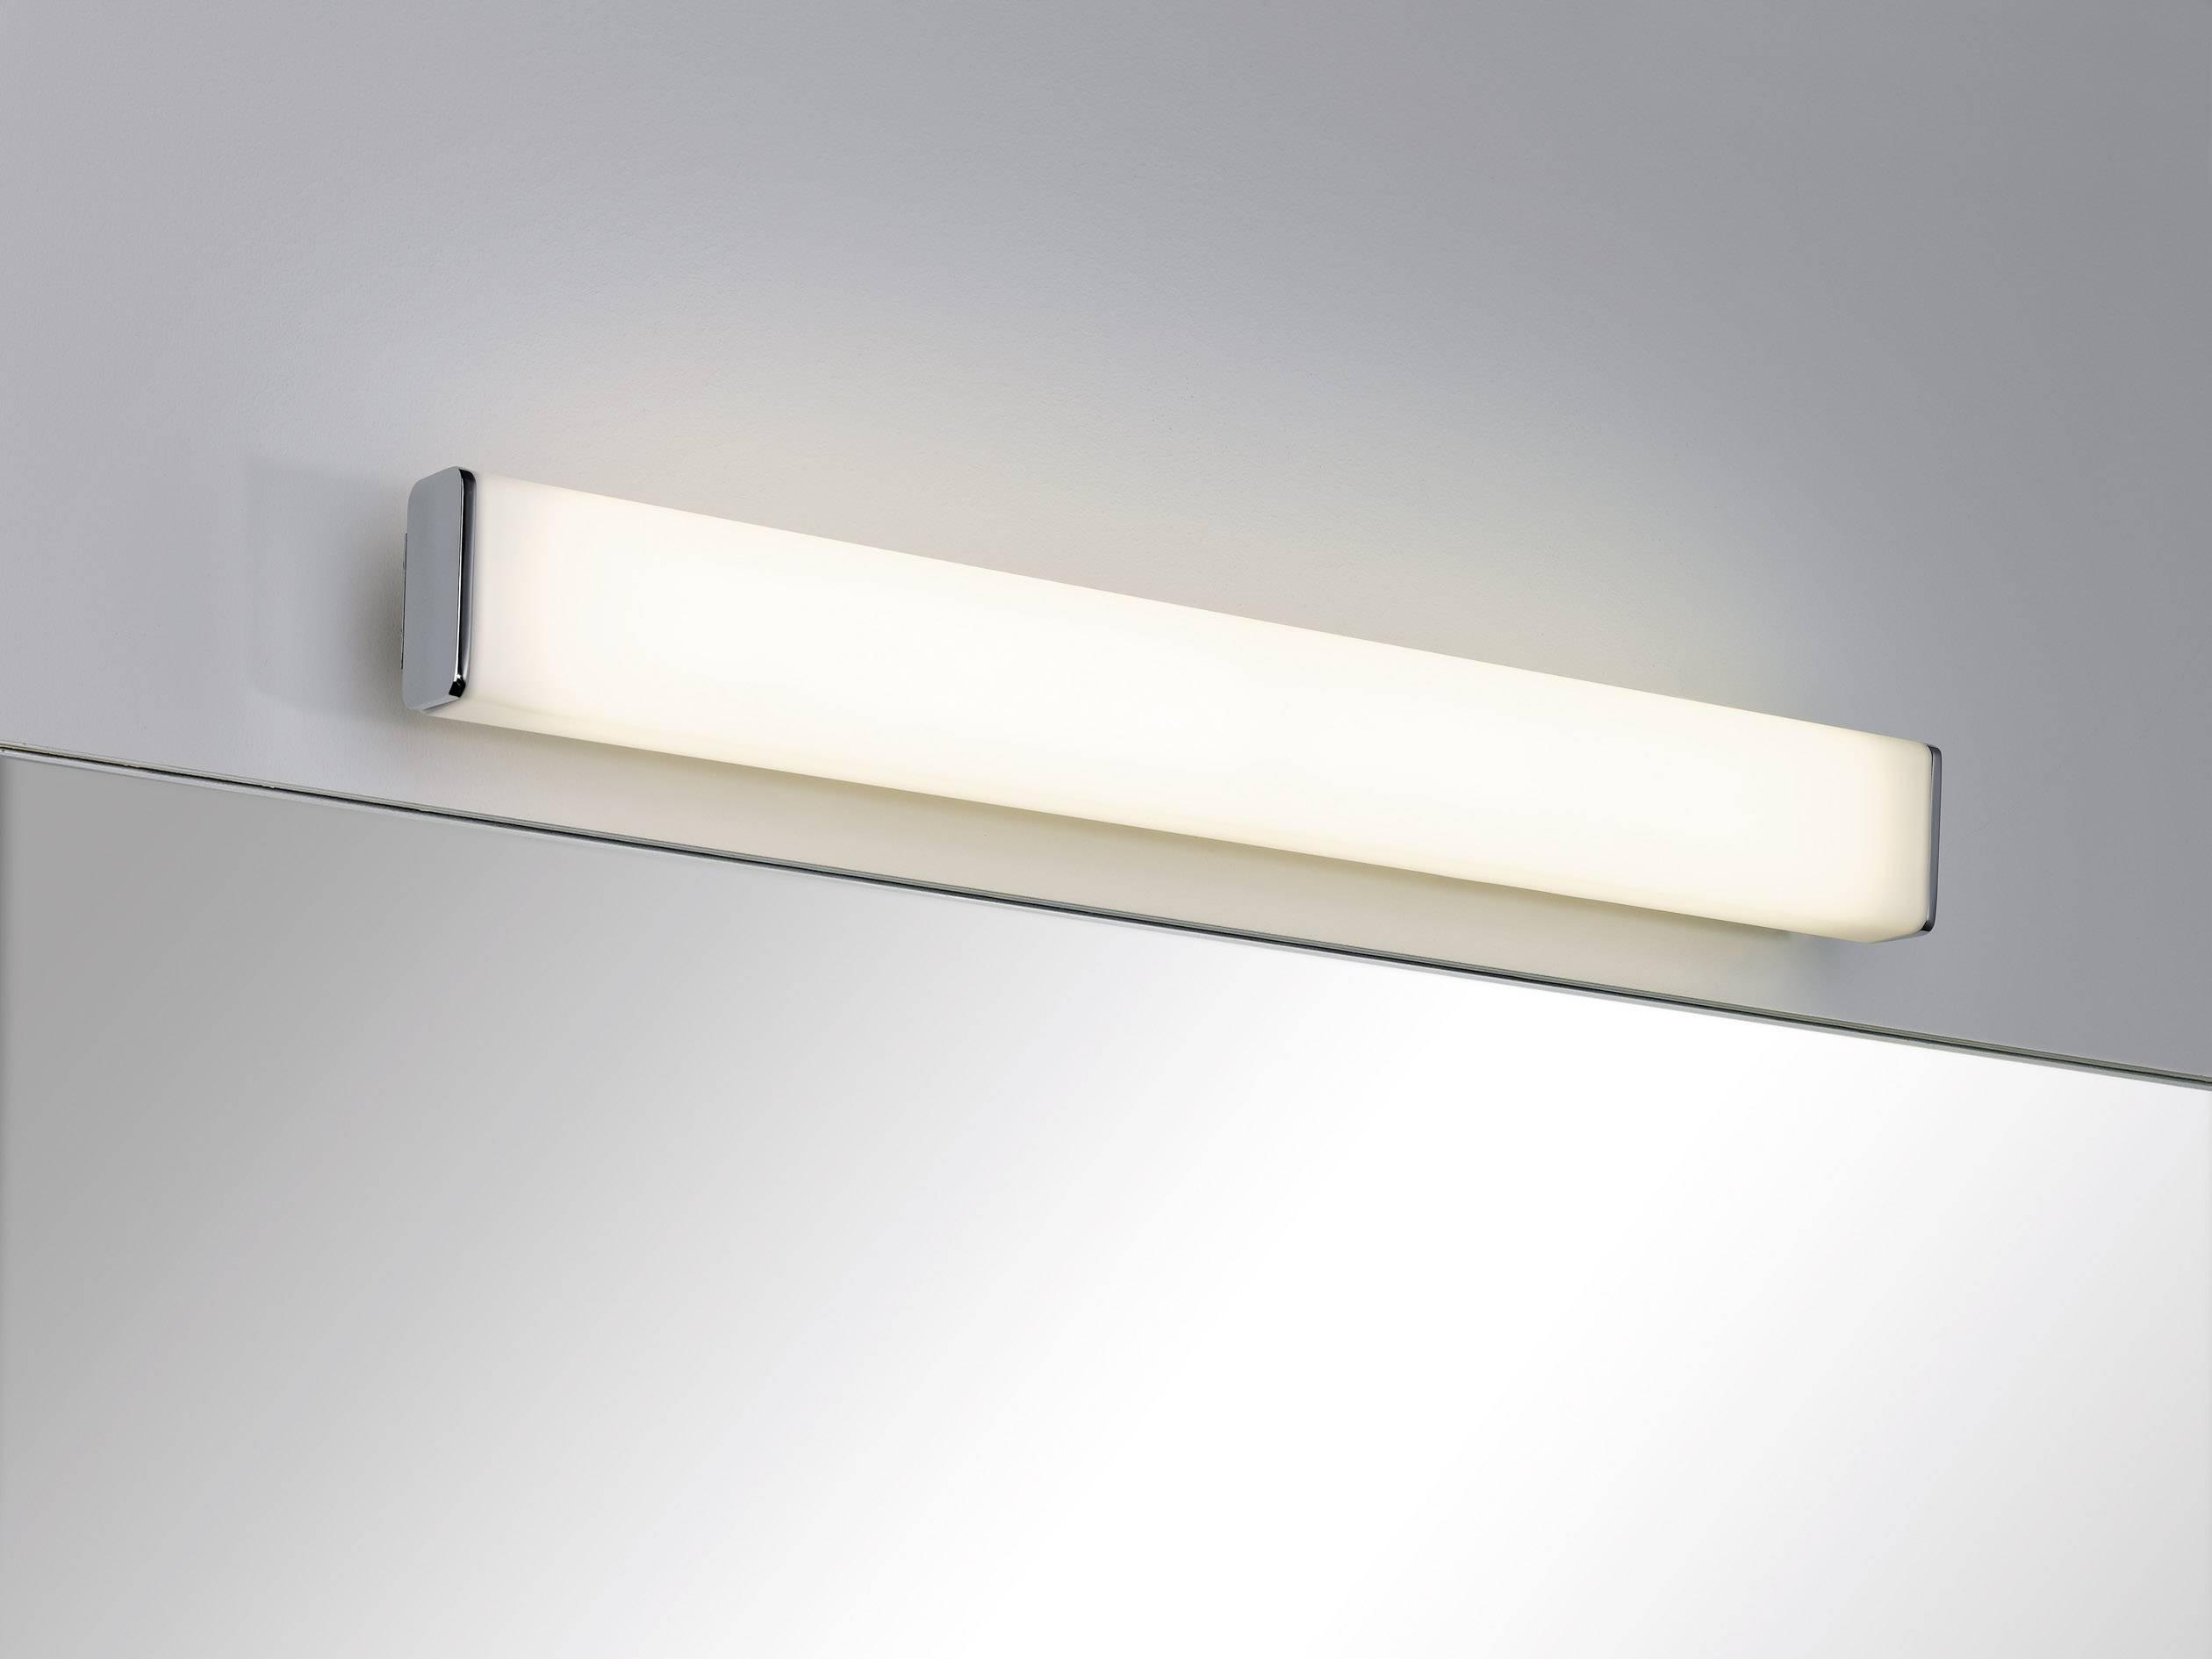 Badkamer Wandlamp Chroom : Led badkamer wandlamp 9 w warm wit paulmann 70464 nembus chroom